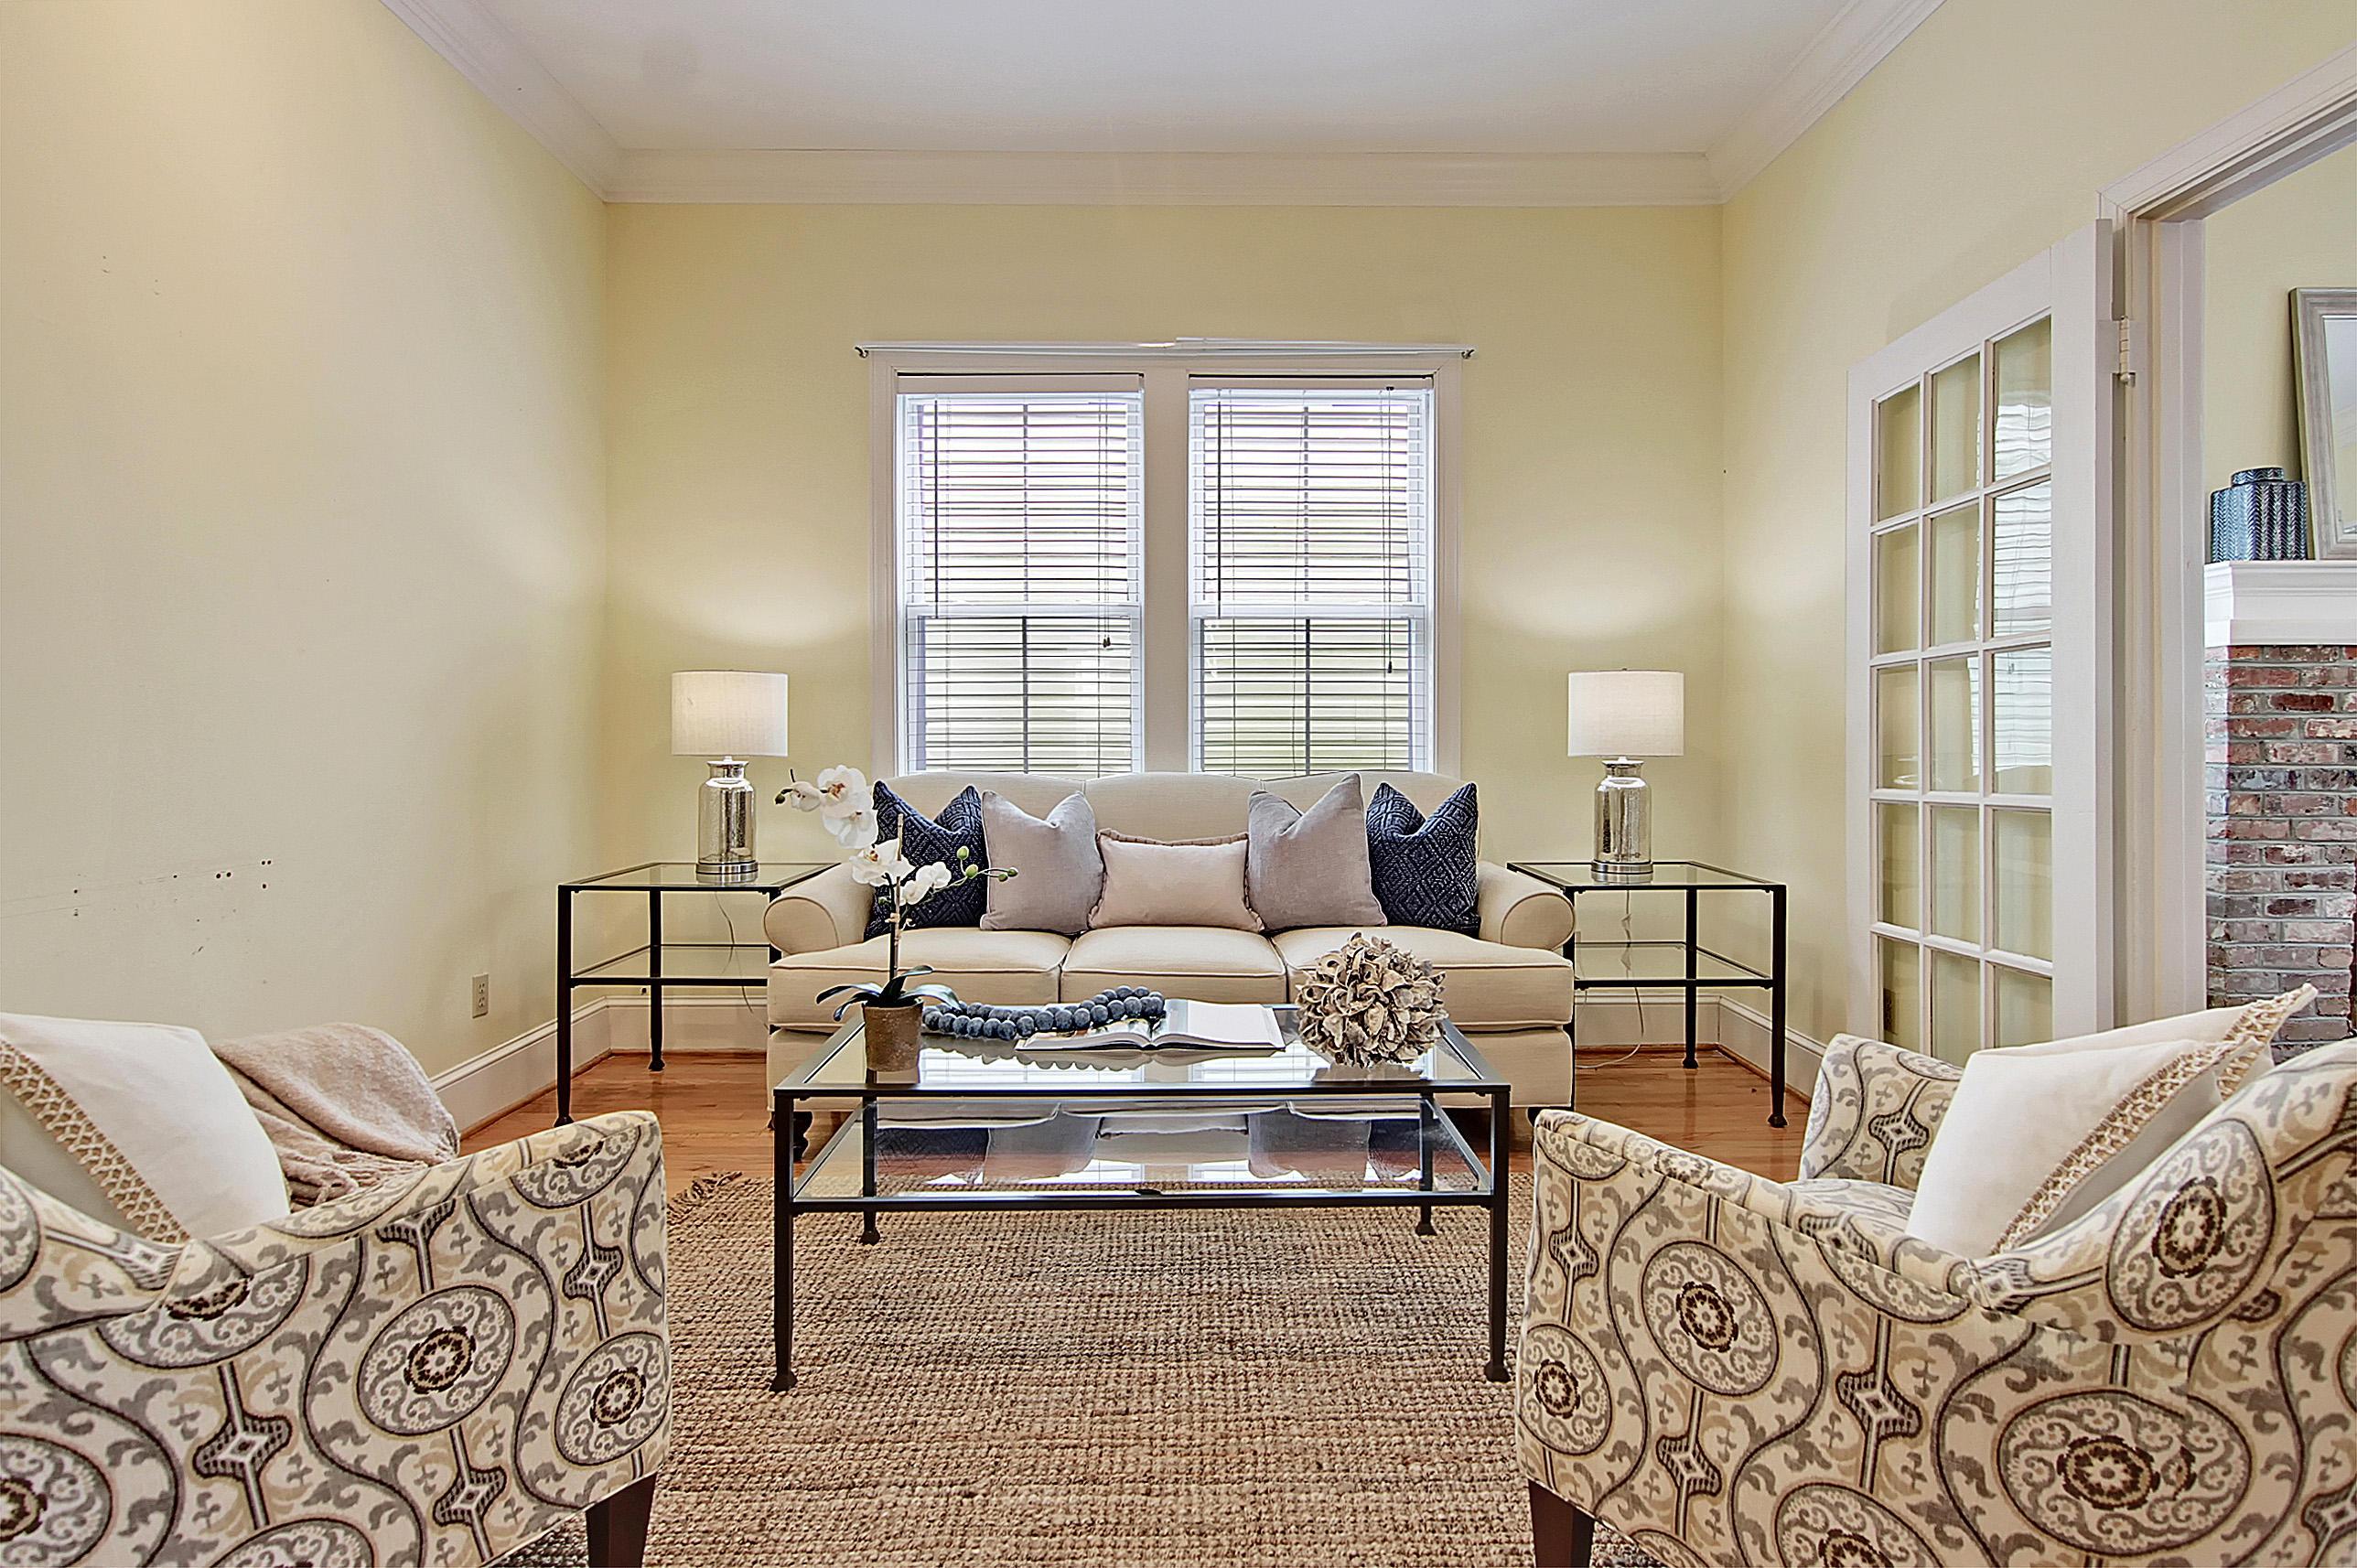 Wagener Terrace Homes For Sale - 136 Darlington, Charleston, SC - 0